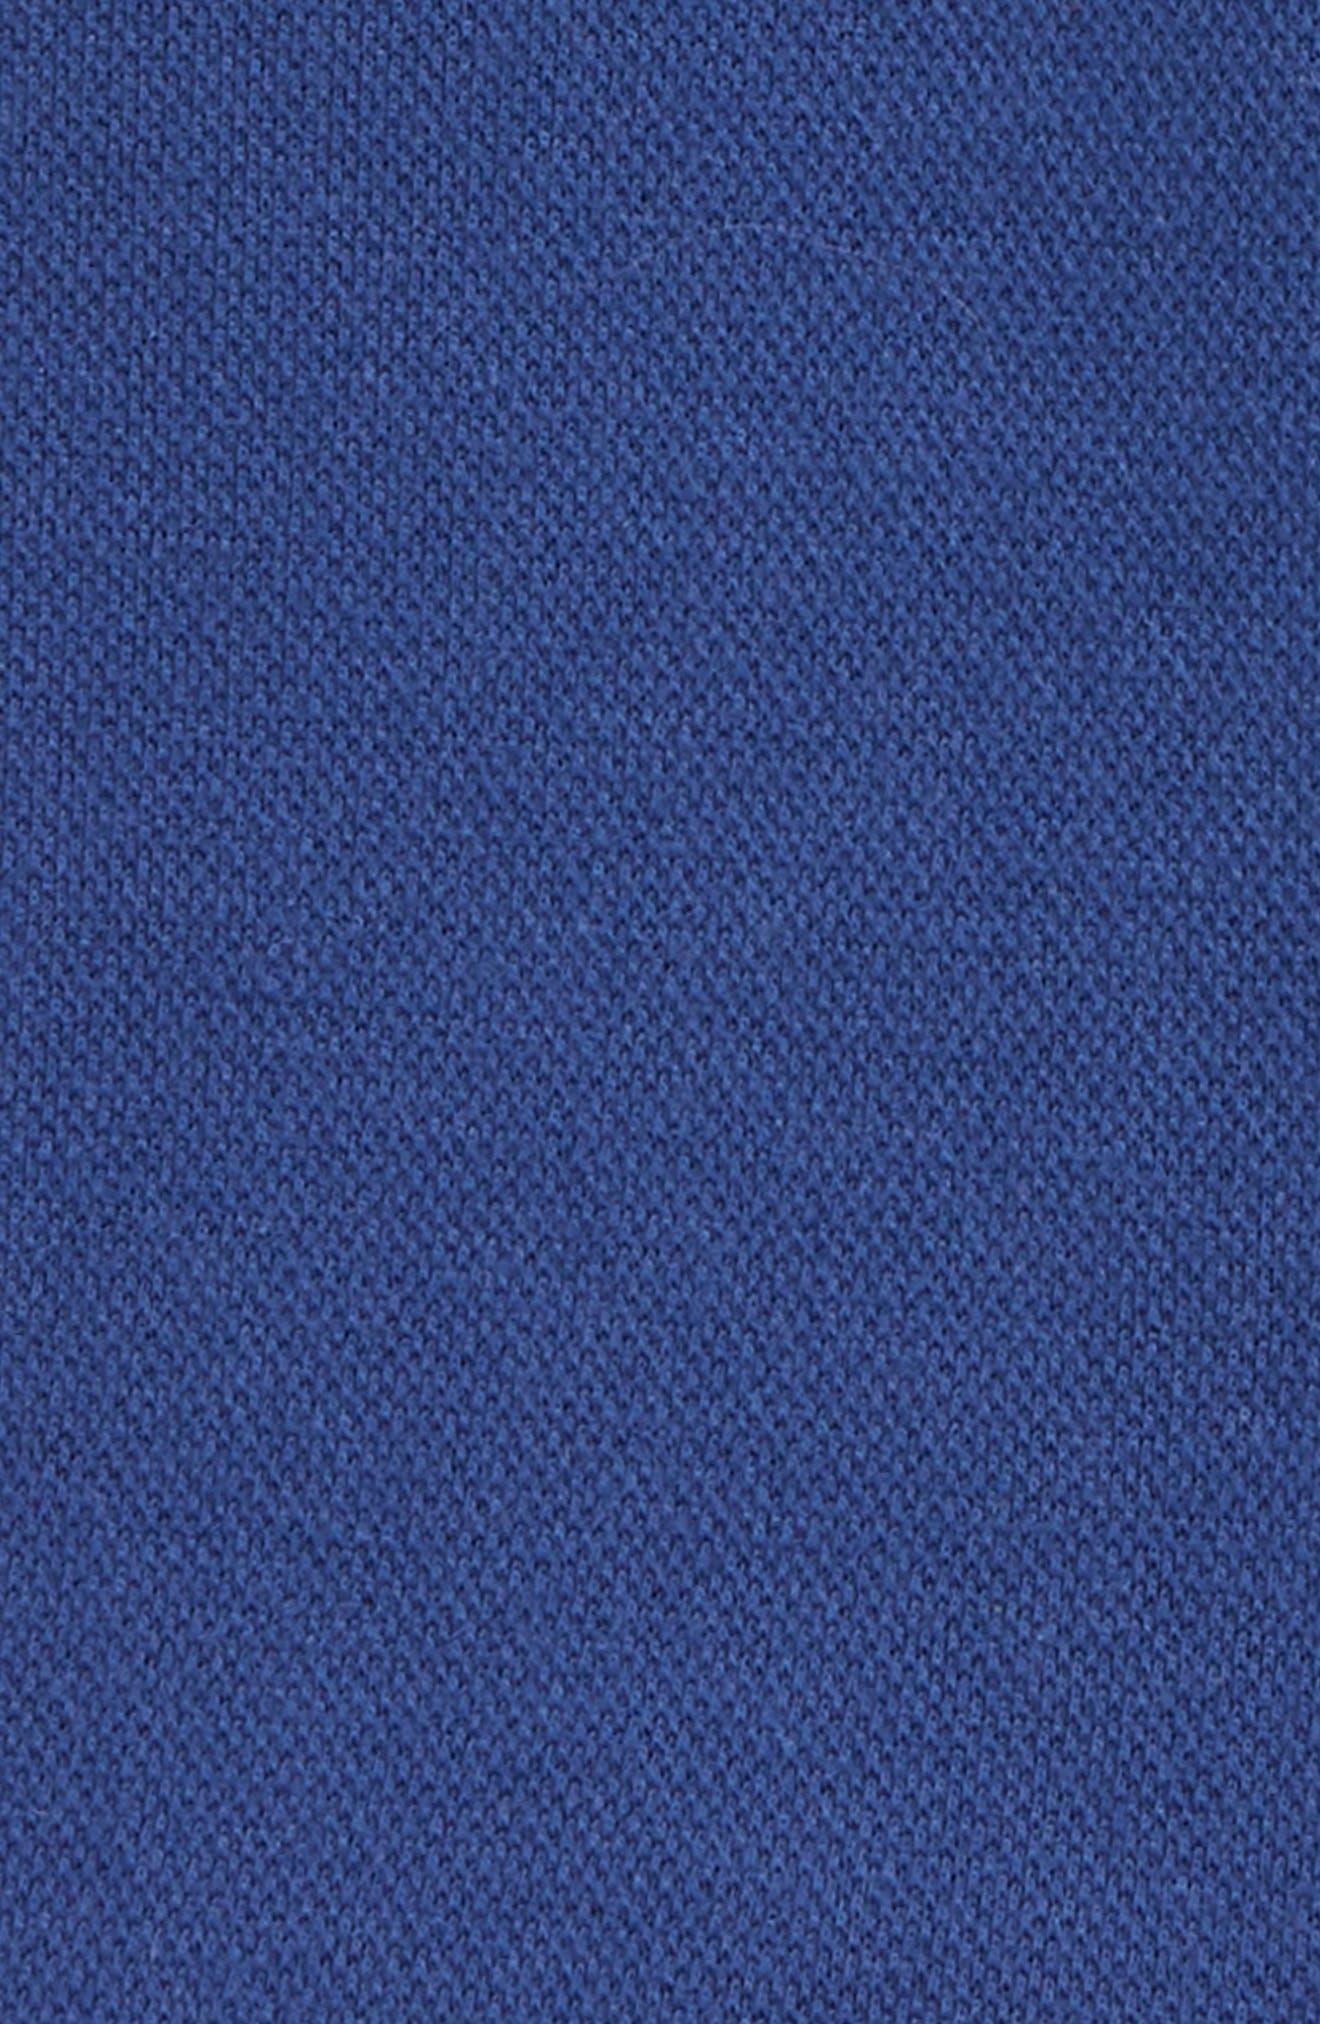 Jersey Chino Shorts,                             Alternate thumbnail 6, color,